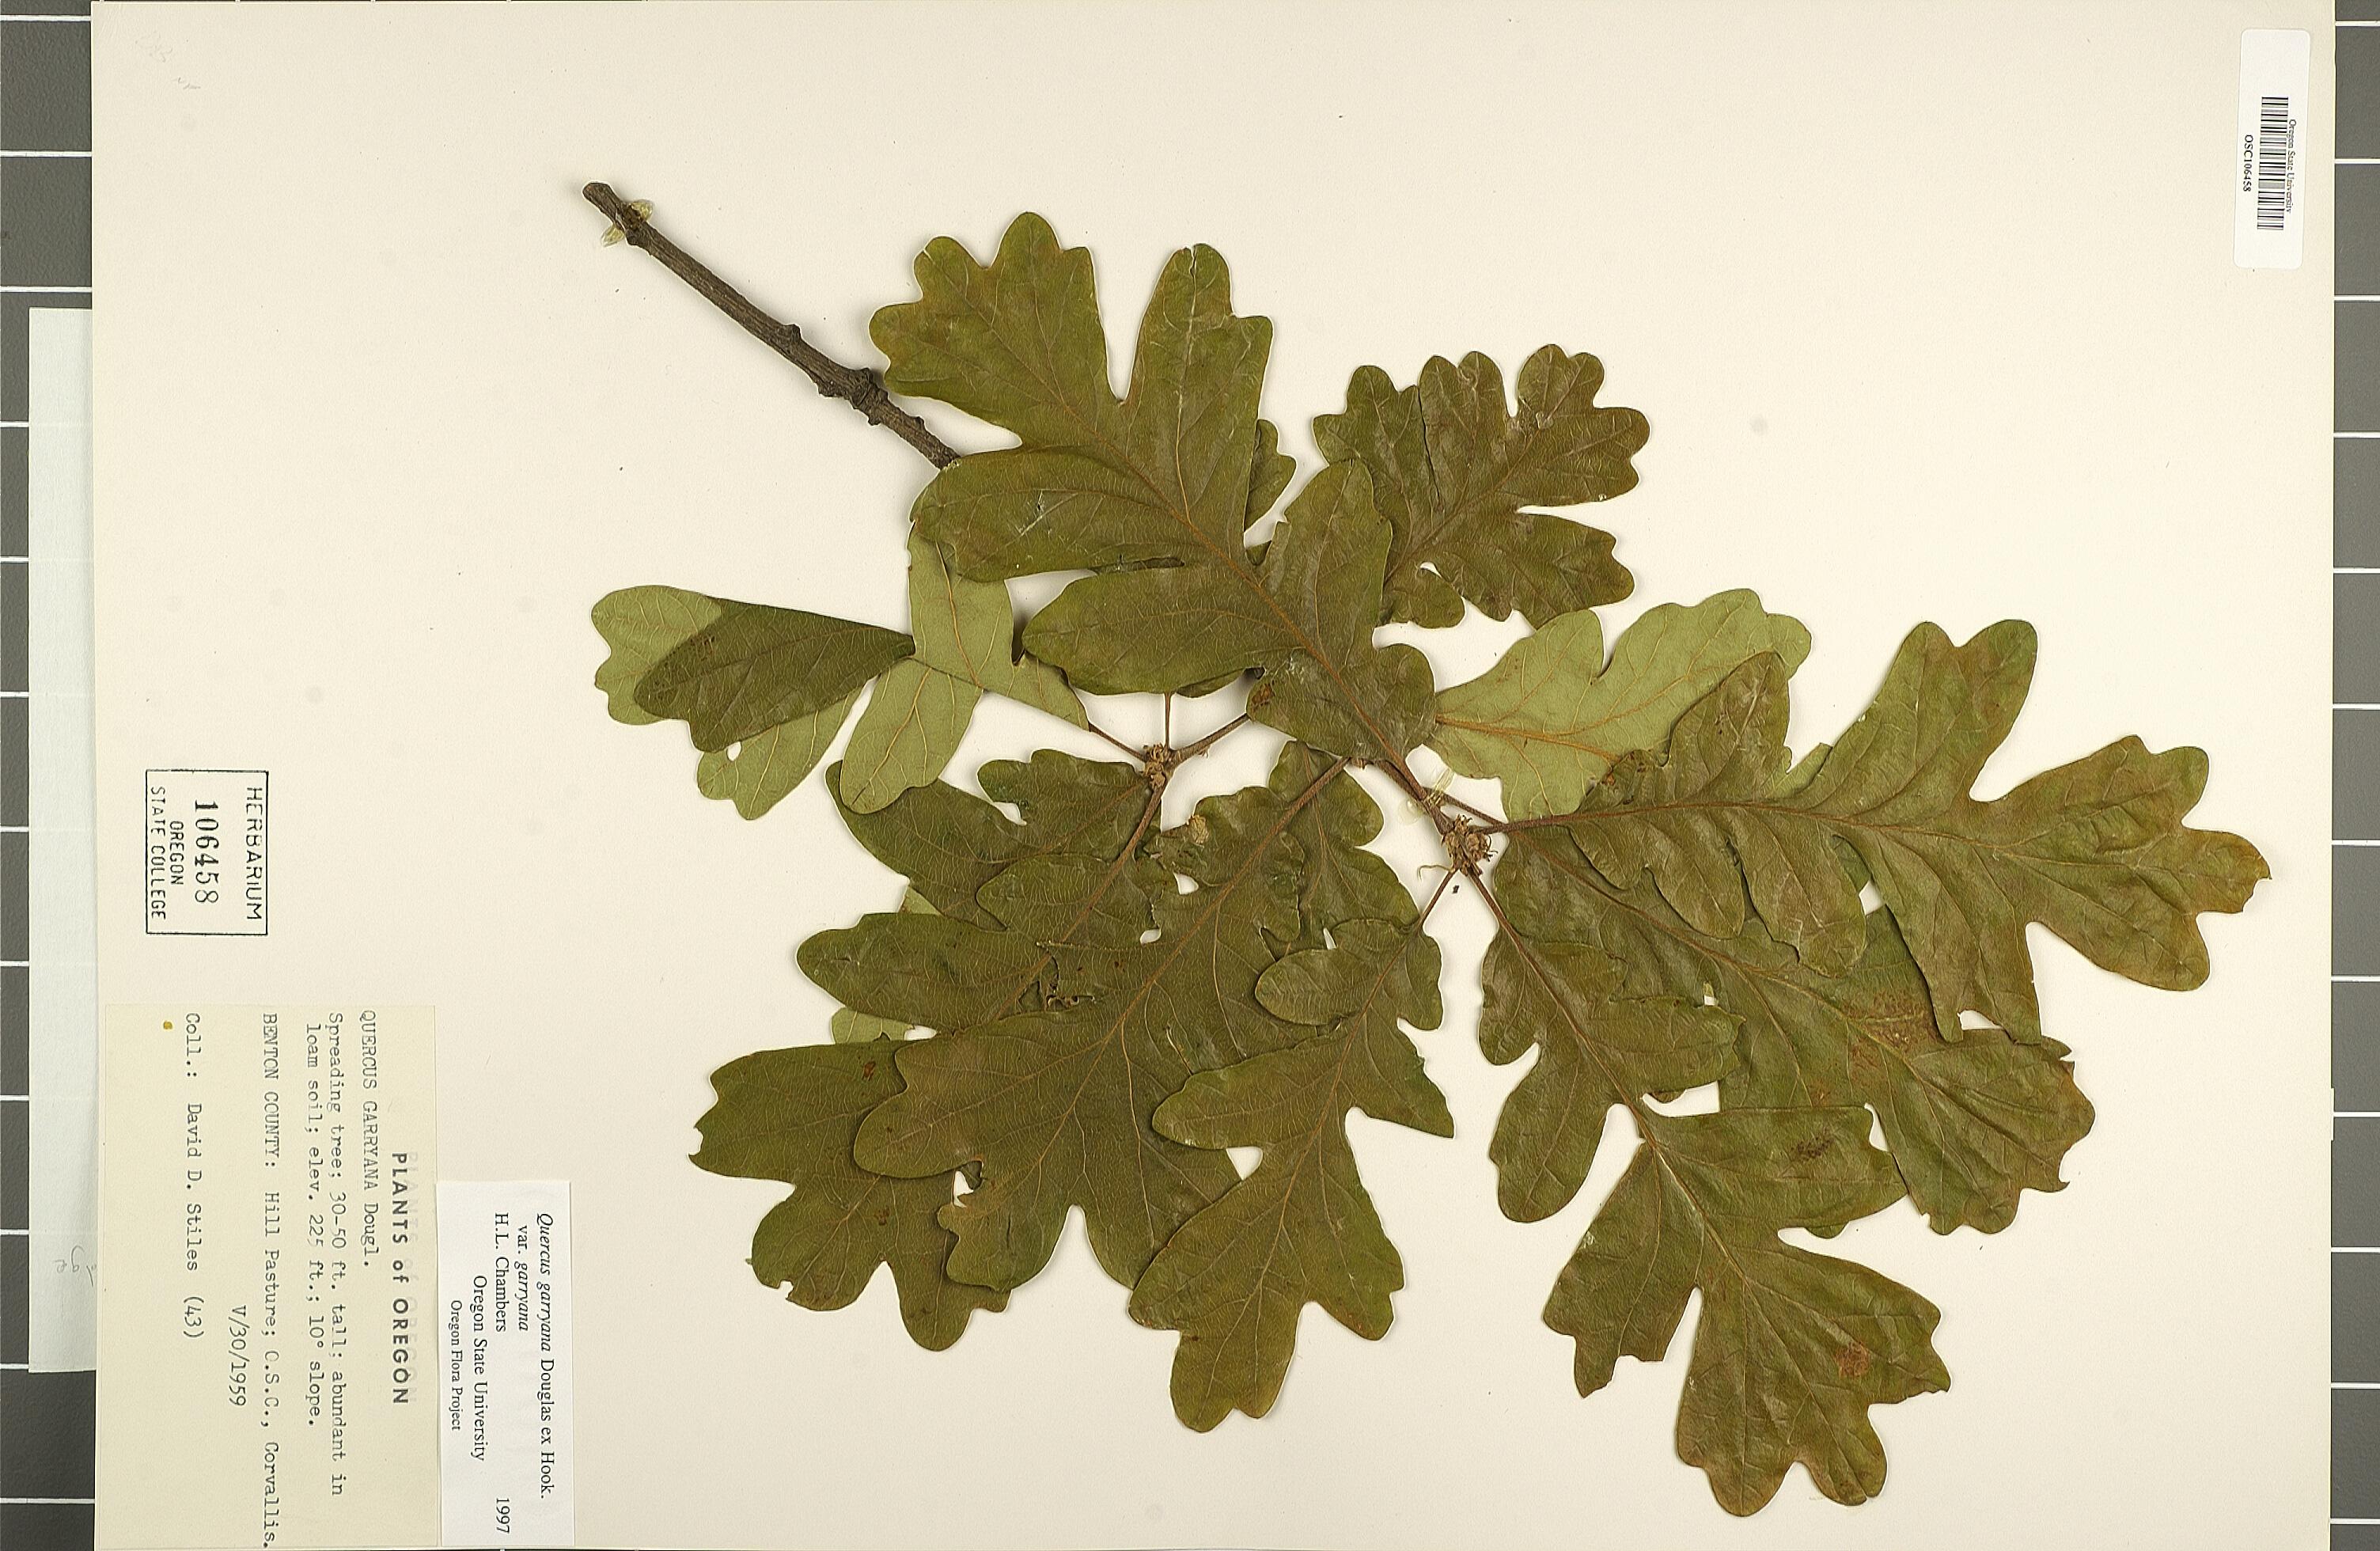 Index of /~tgd/leaves/dataset/herbarium/garryana